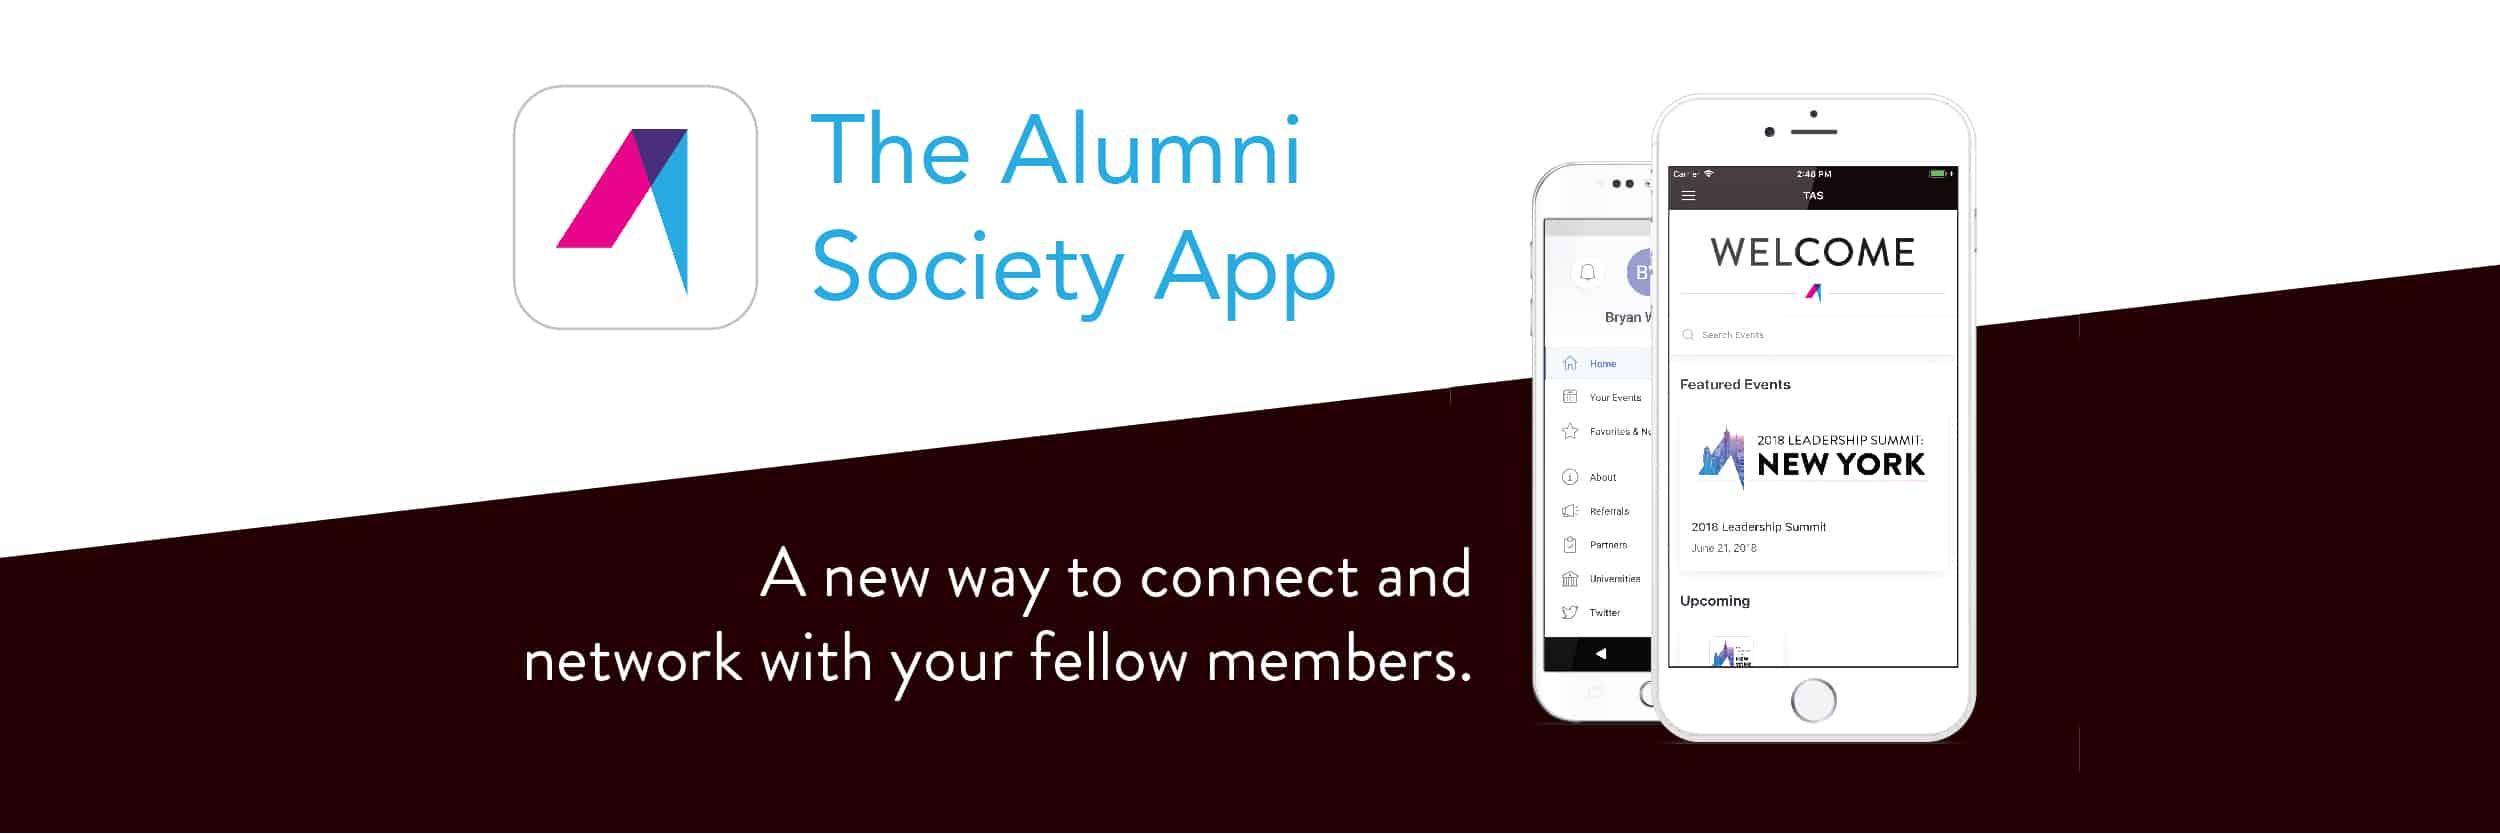 The Alumni Society App - The Alumni Society